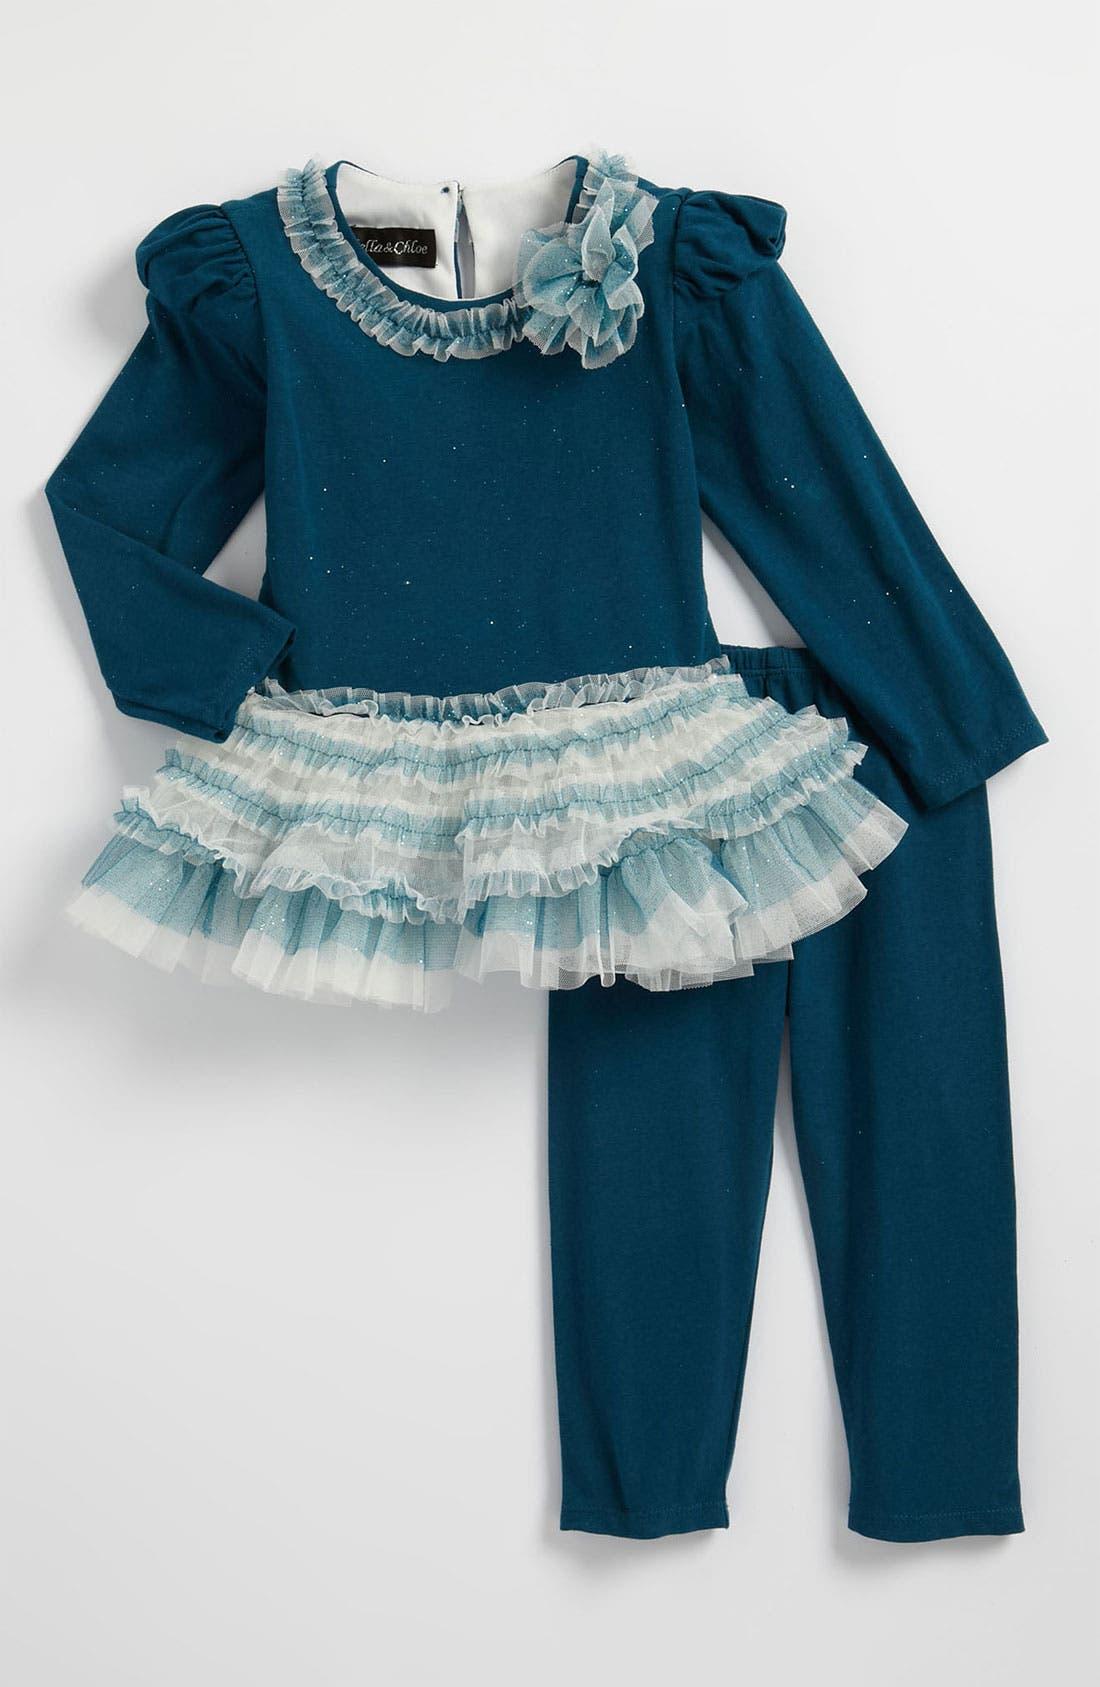 Alternate Image 1 Selected - Isobella & Chloe Tutu Dress & Leggings (Toddler)